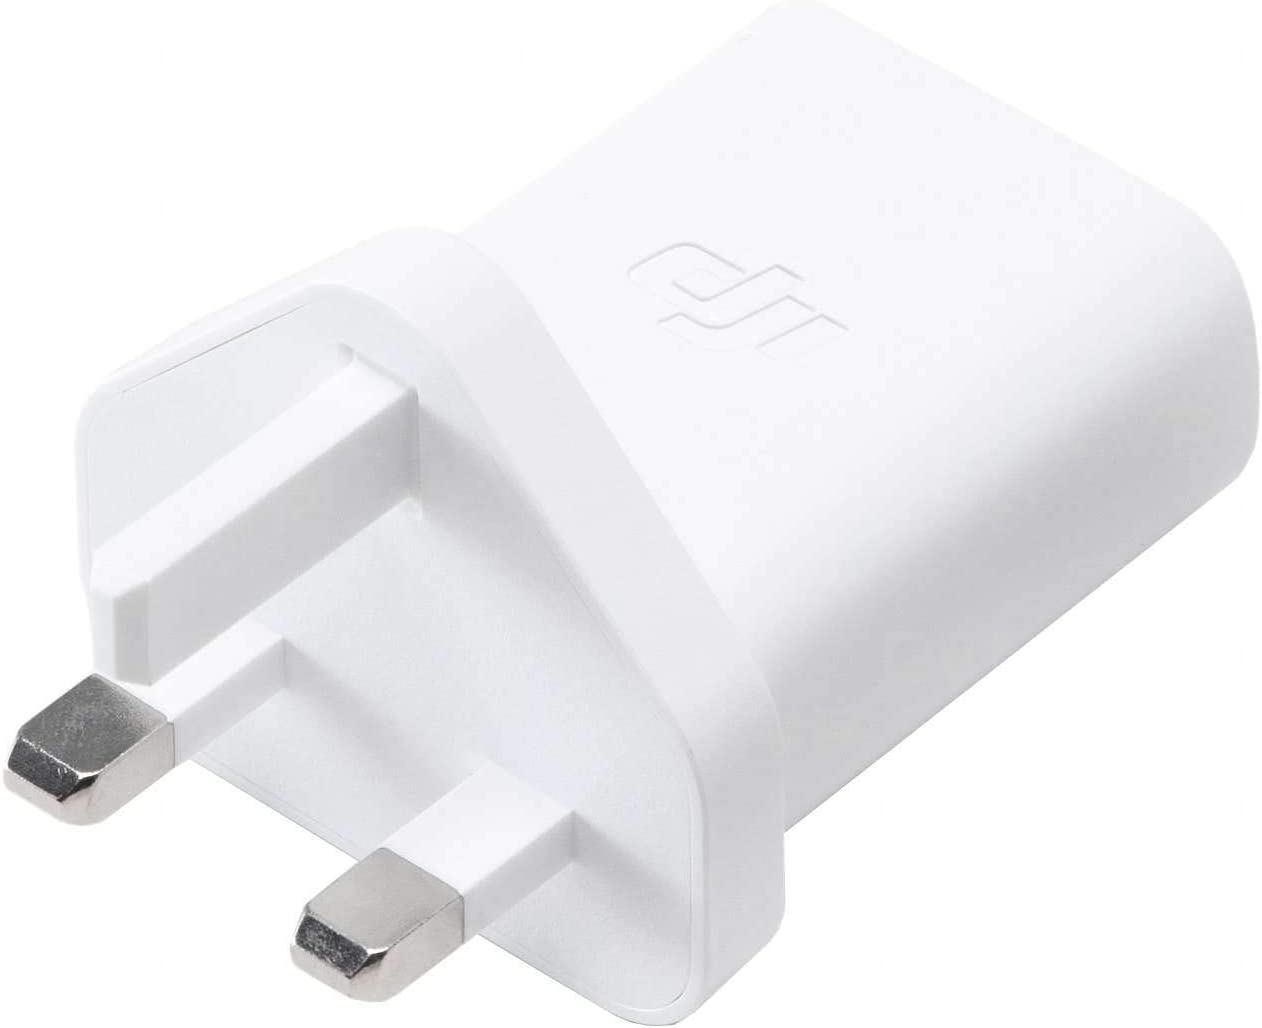 DJI Mavic Mini Part 15 18W USB Charger EU Plug: Amazon.es